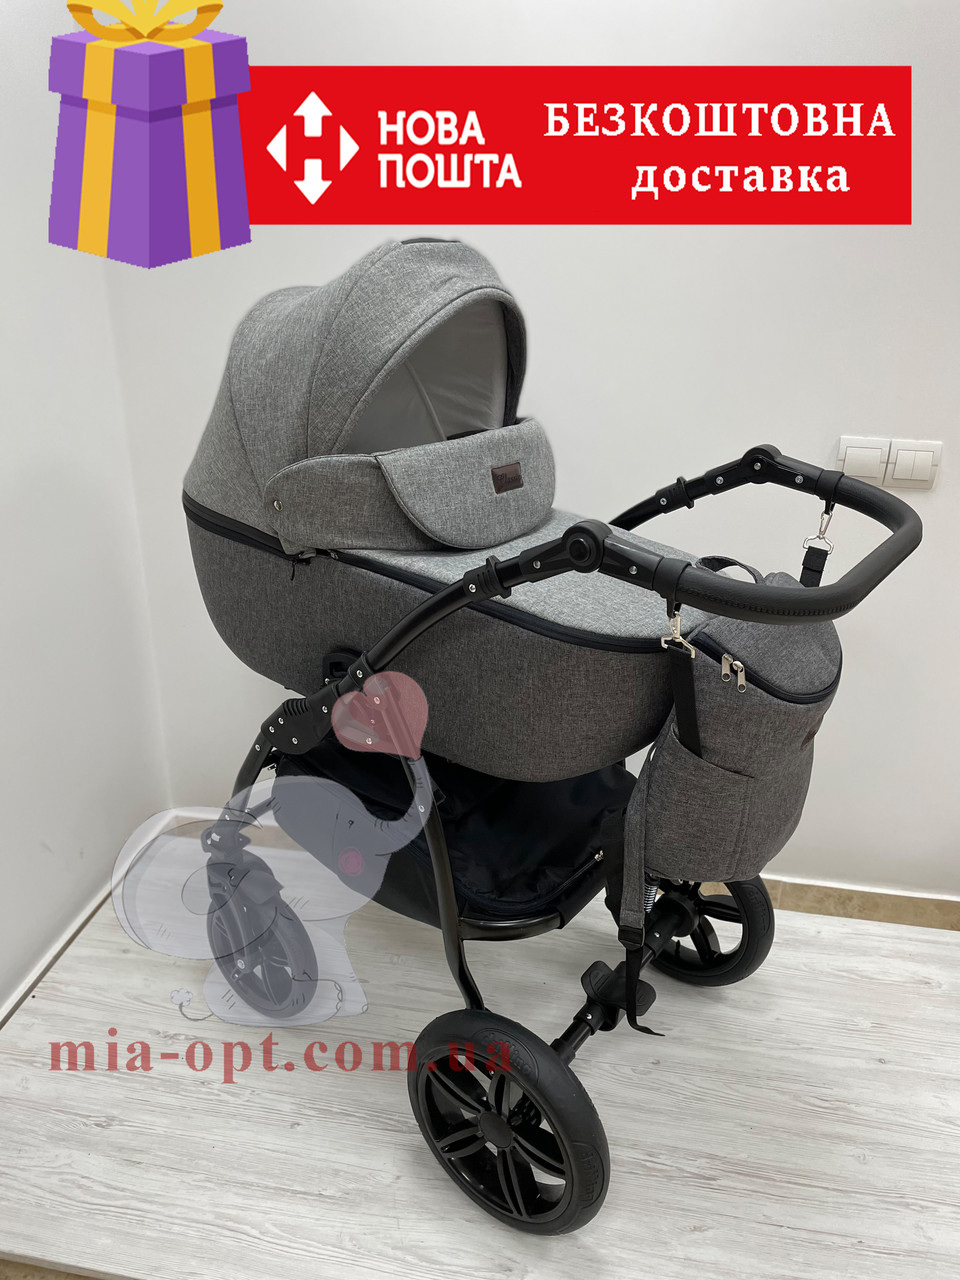 Дитяча коляска 2 в 1 Classik Len(Класик Льон) Victoria Gold Графіт сіра